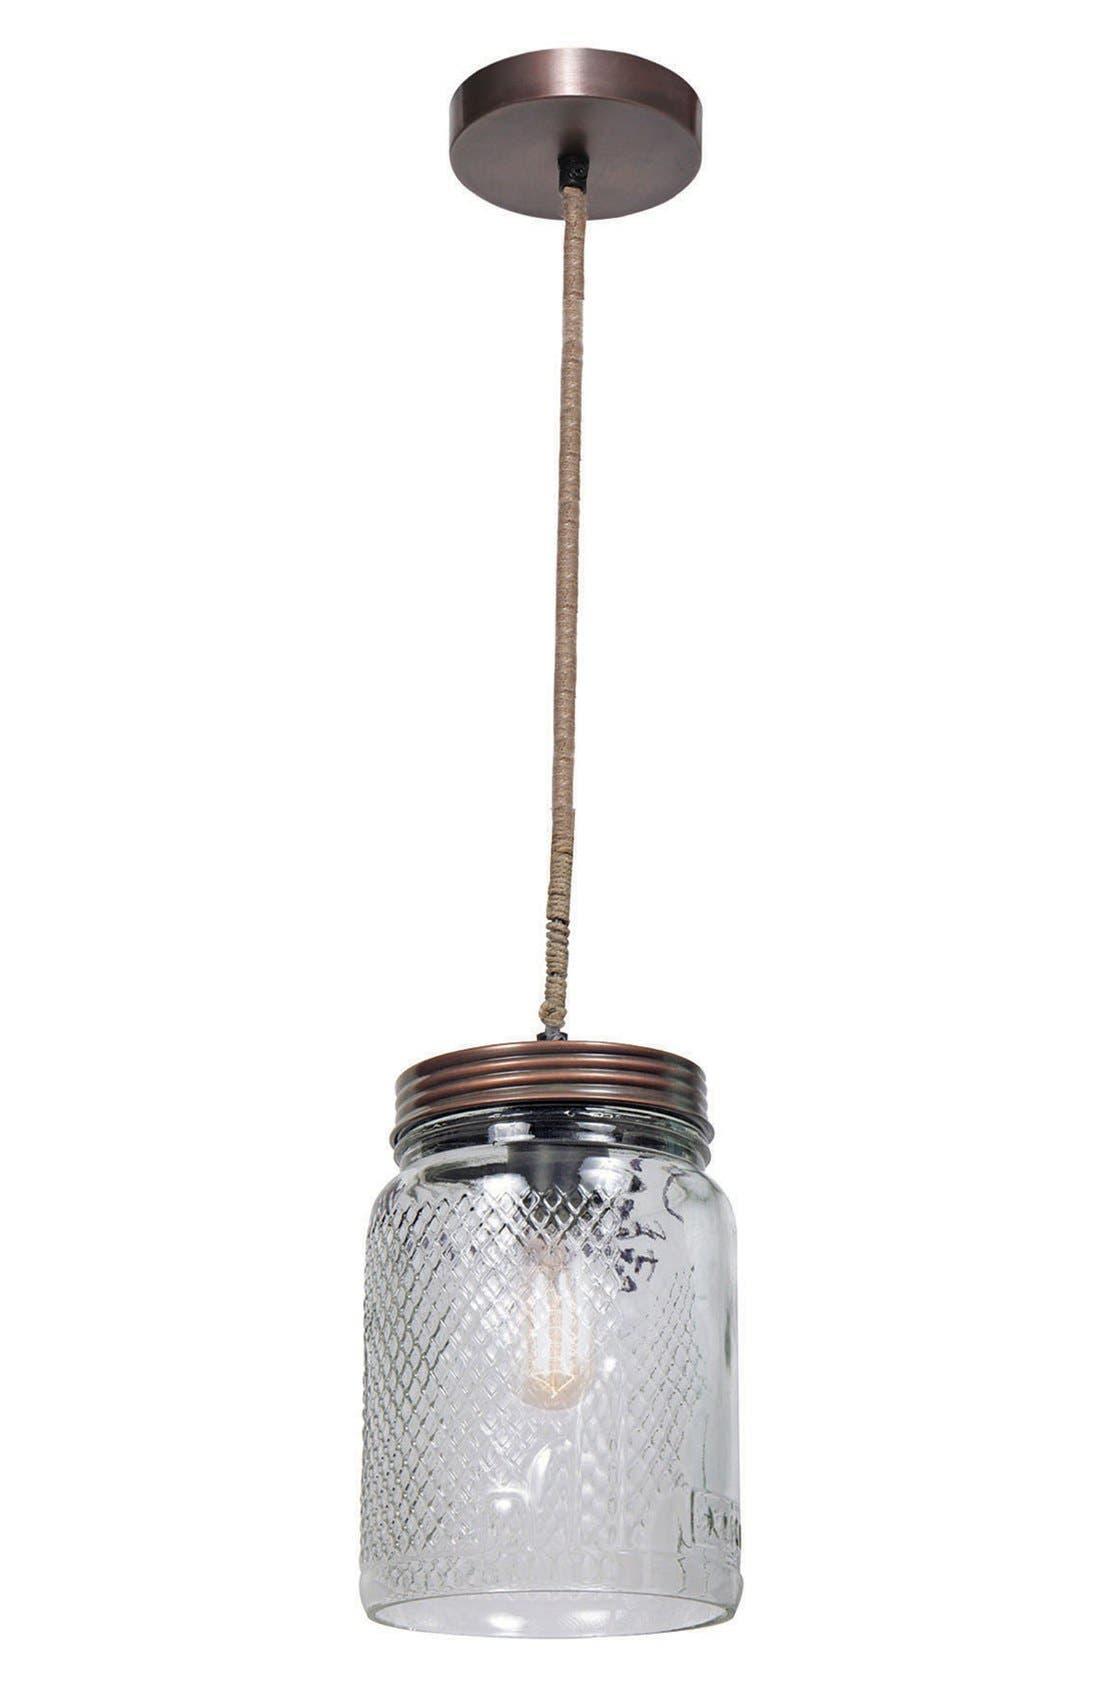 Renwil 'Mason Jar' Ceiling Light Fixture